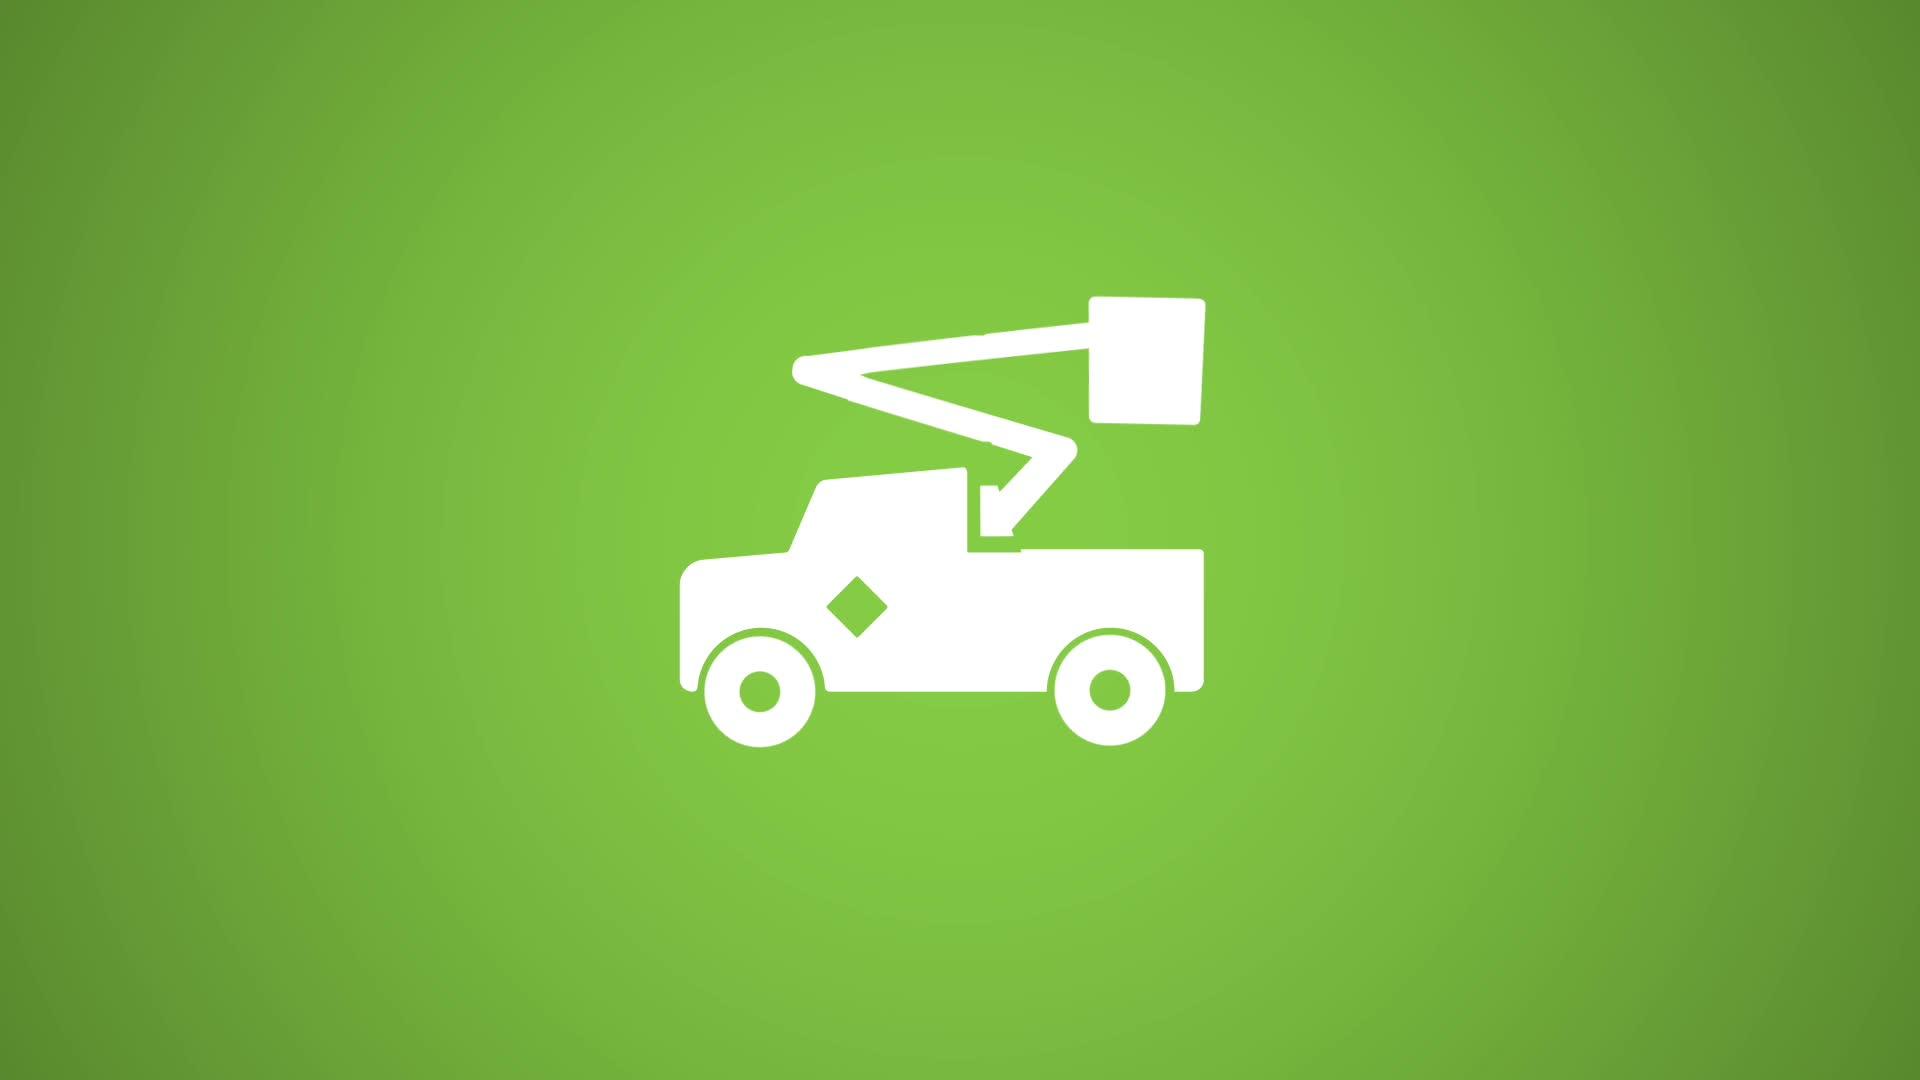 transportation, truck, trucks, PSE truck GIF GIFs